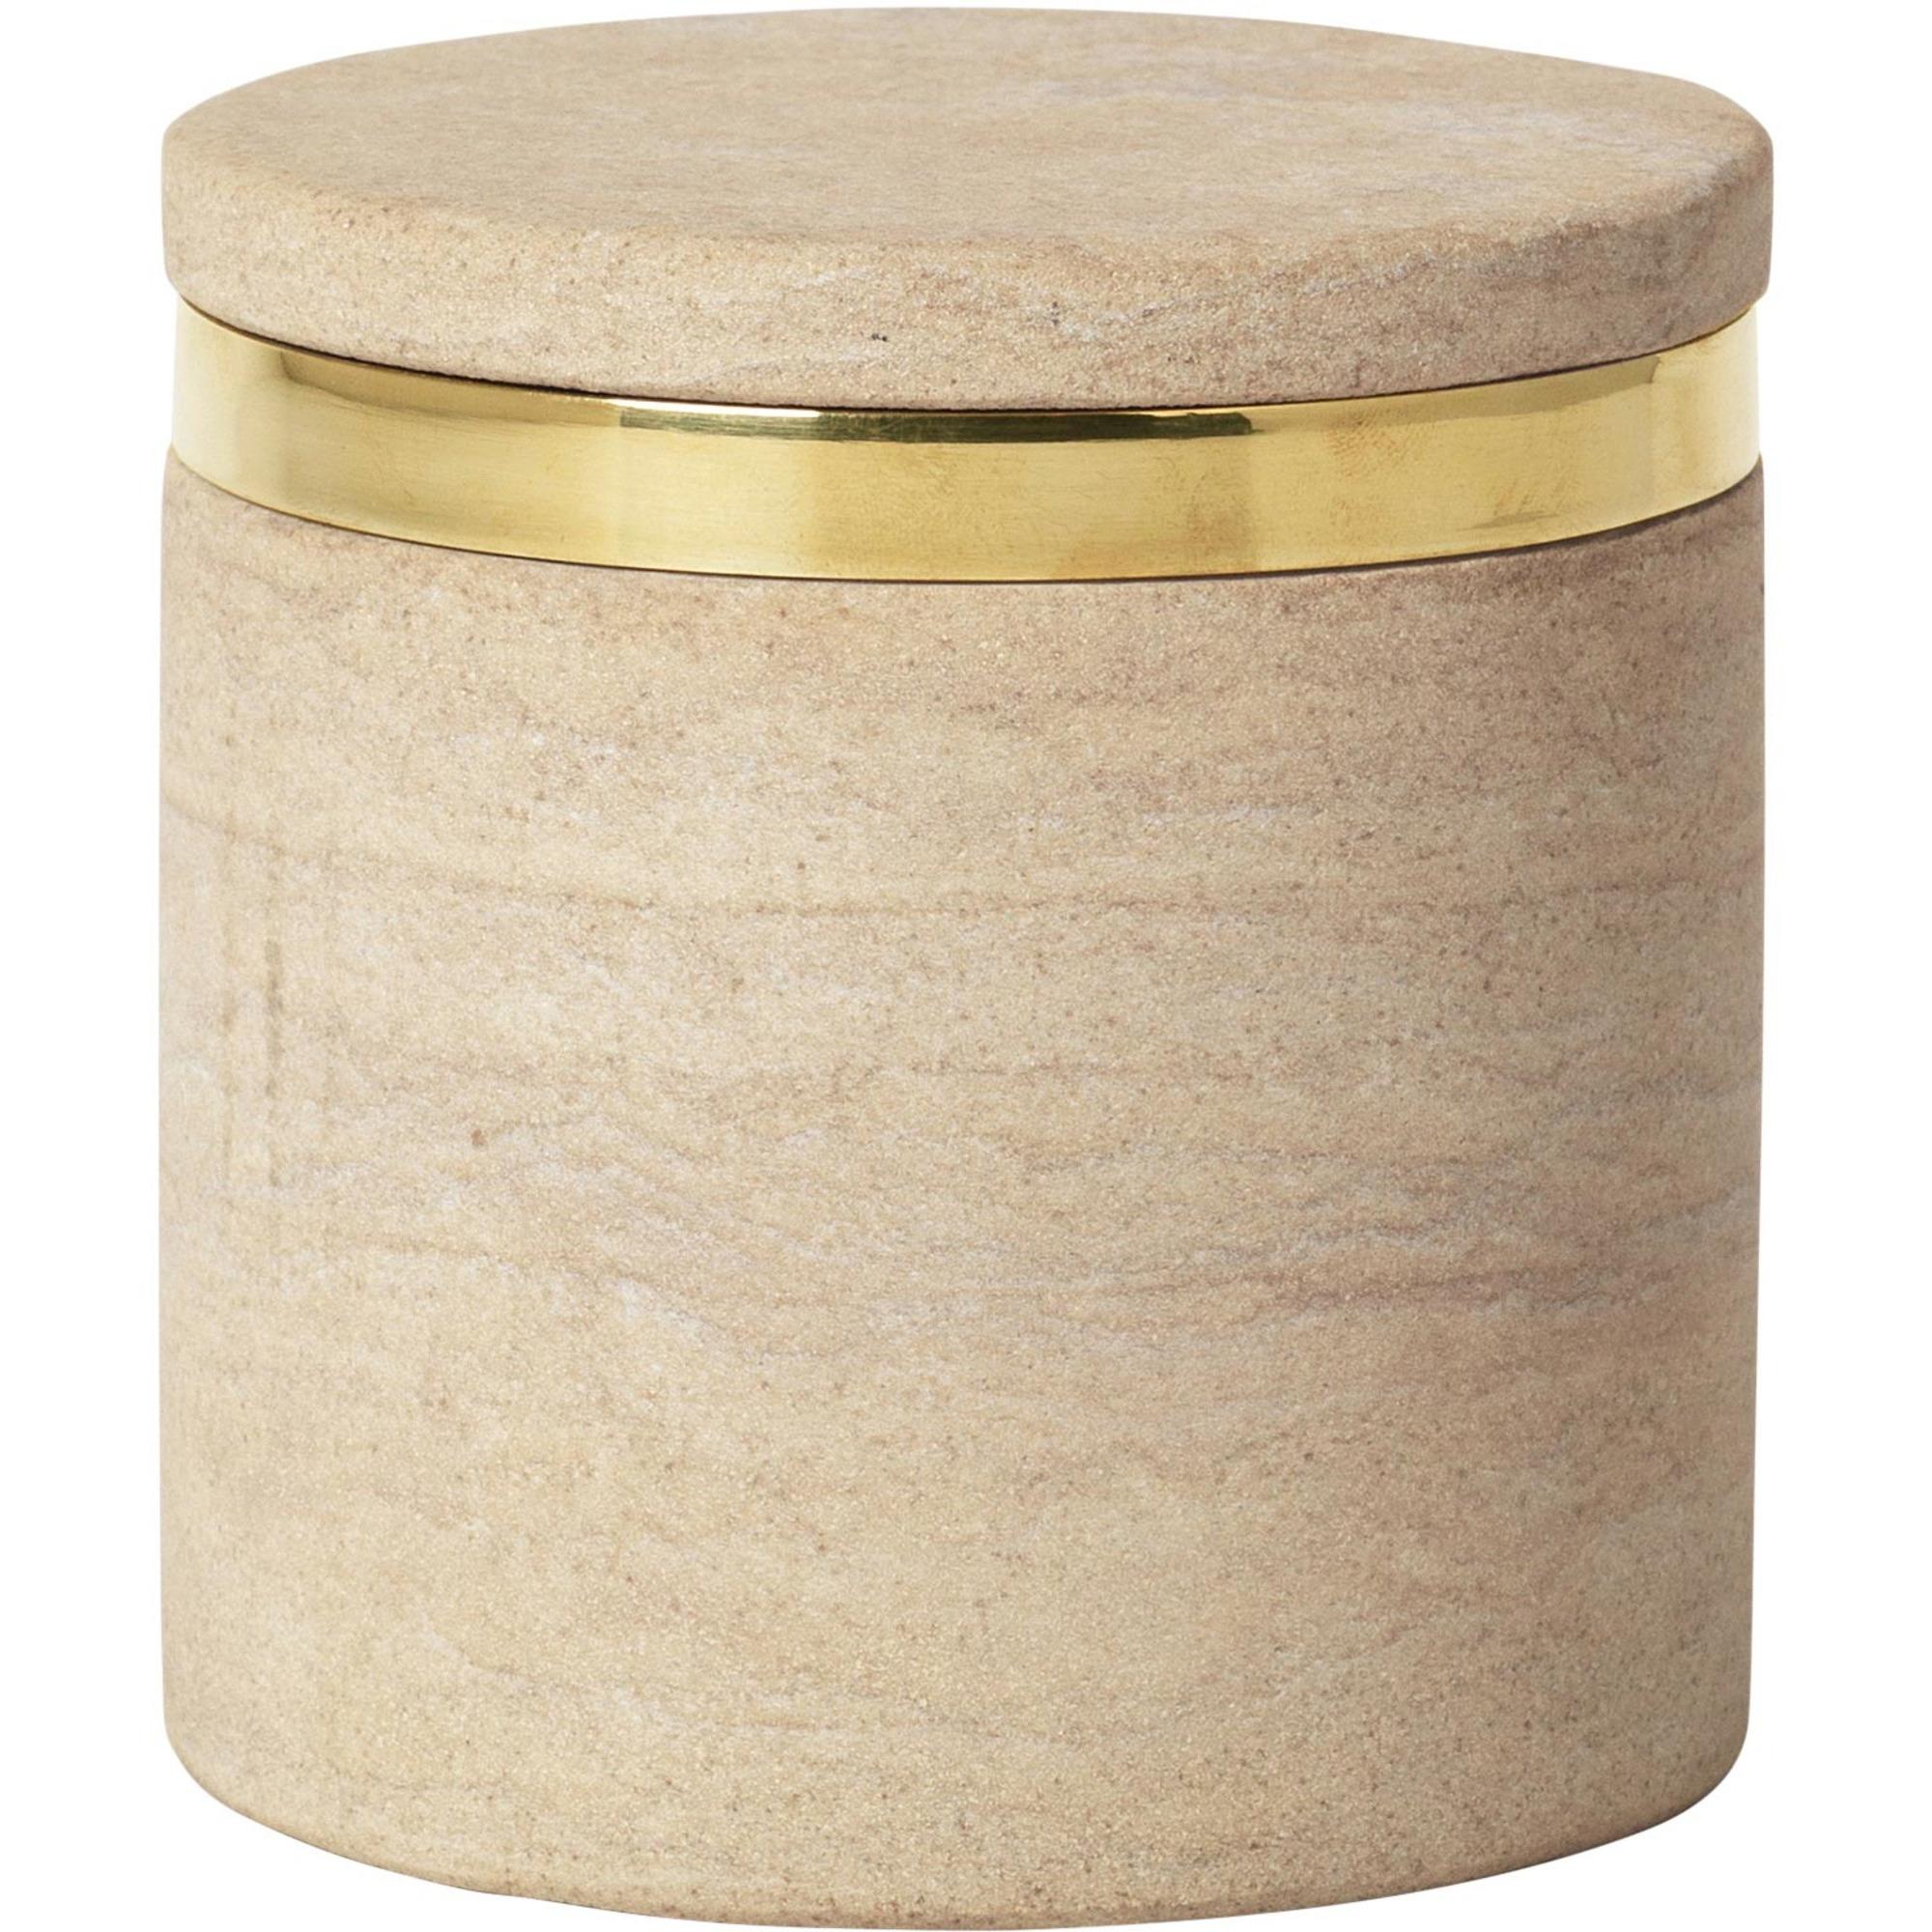 Broste Copenhagen Burk 'Ring' i färgen 'Sand Stone' S